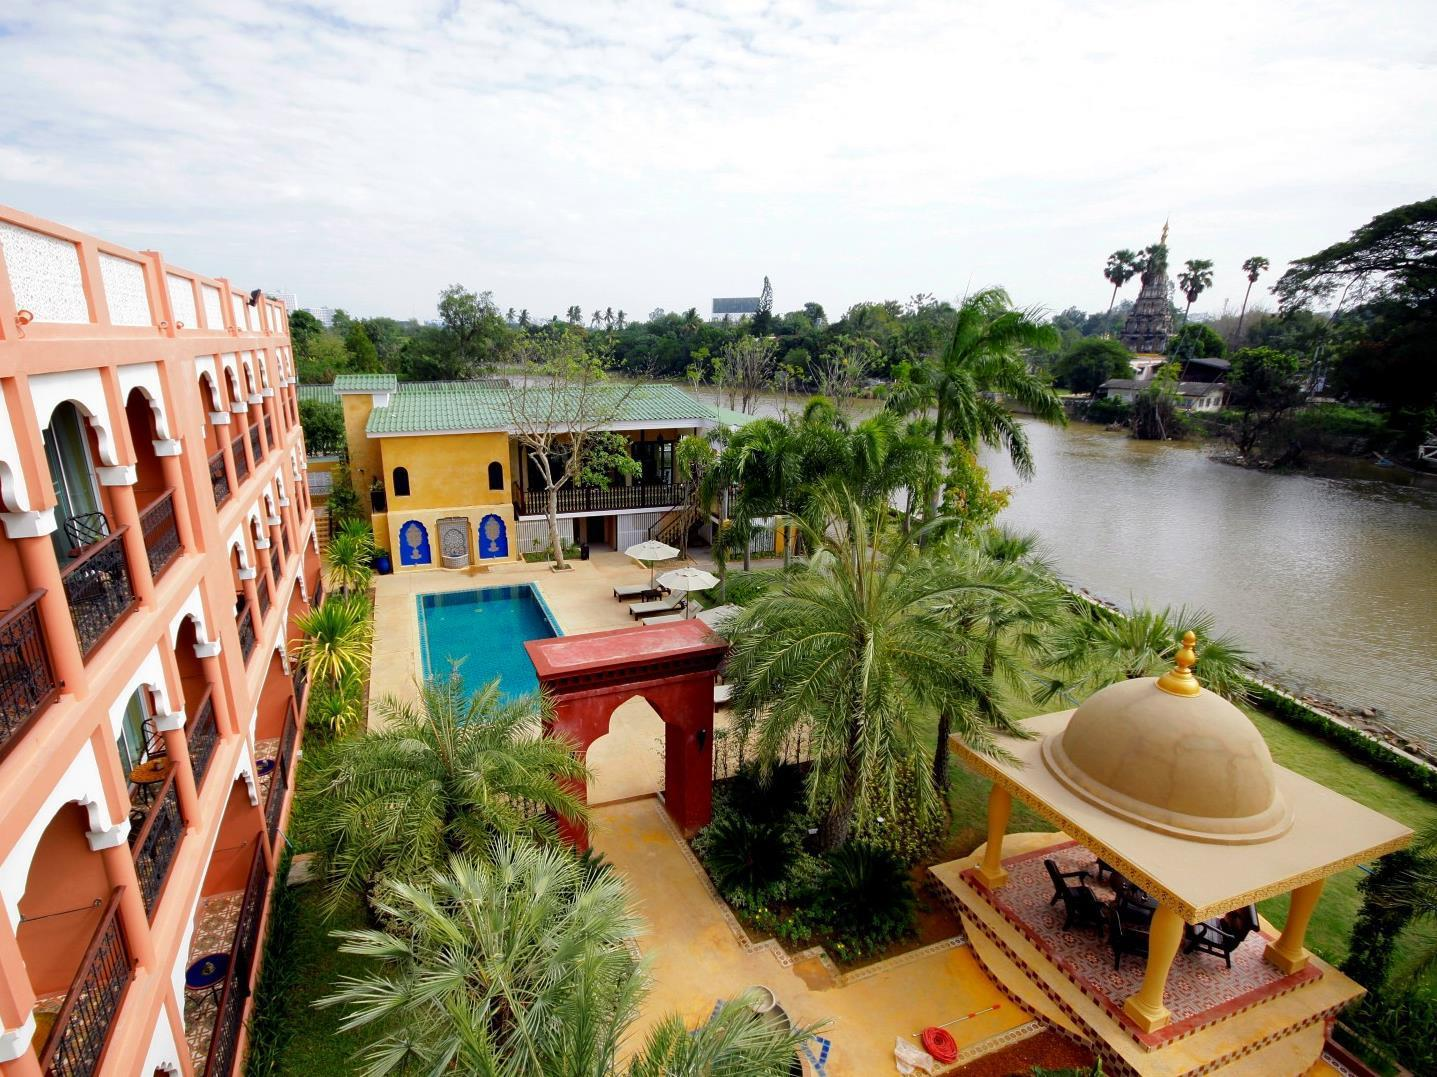 Sheik Istana Hotel โรงแรมชีค อิซทานา